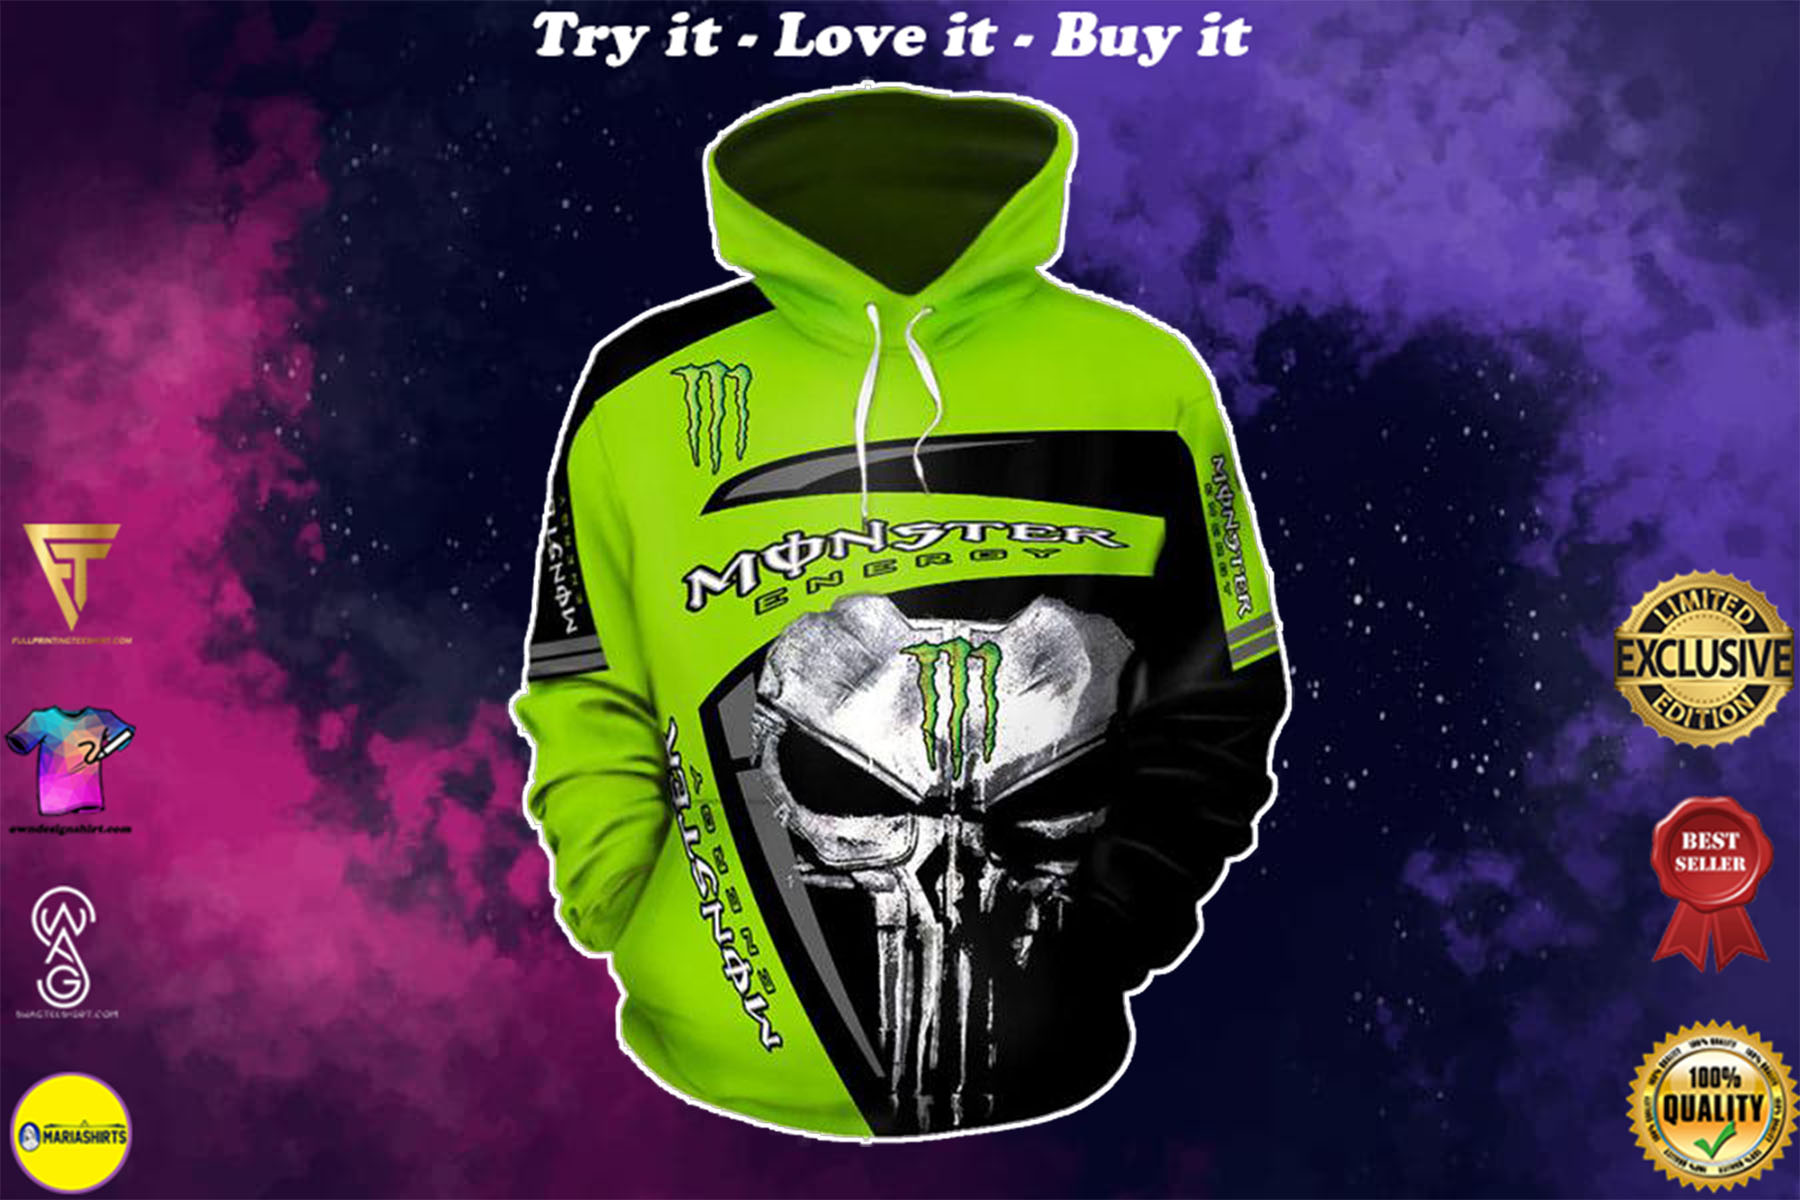 [special edition] skull fox racing fox is the leader in motocross full printing shirt - maria